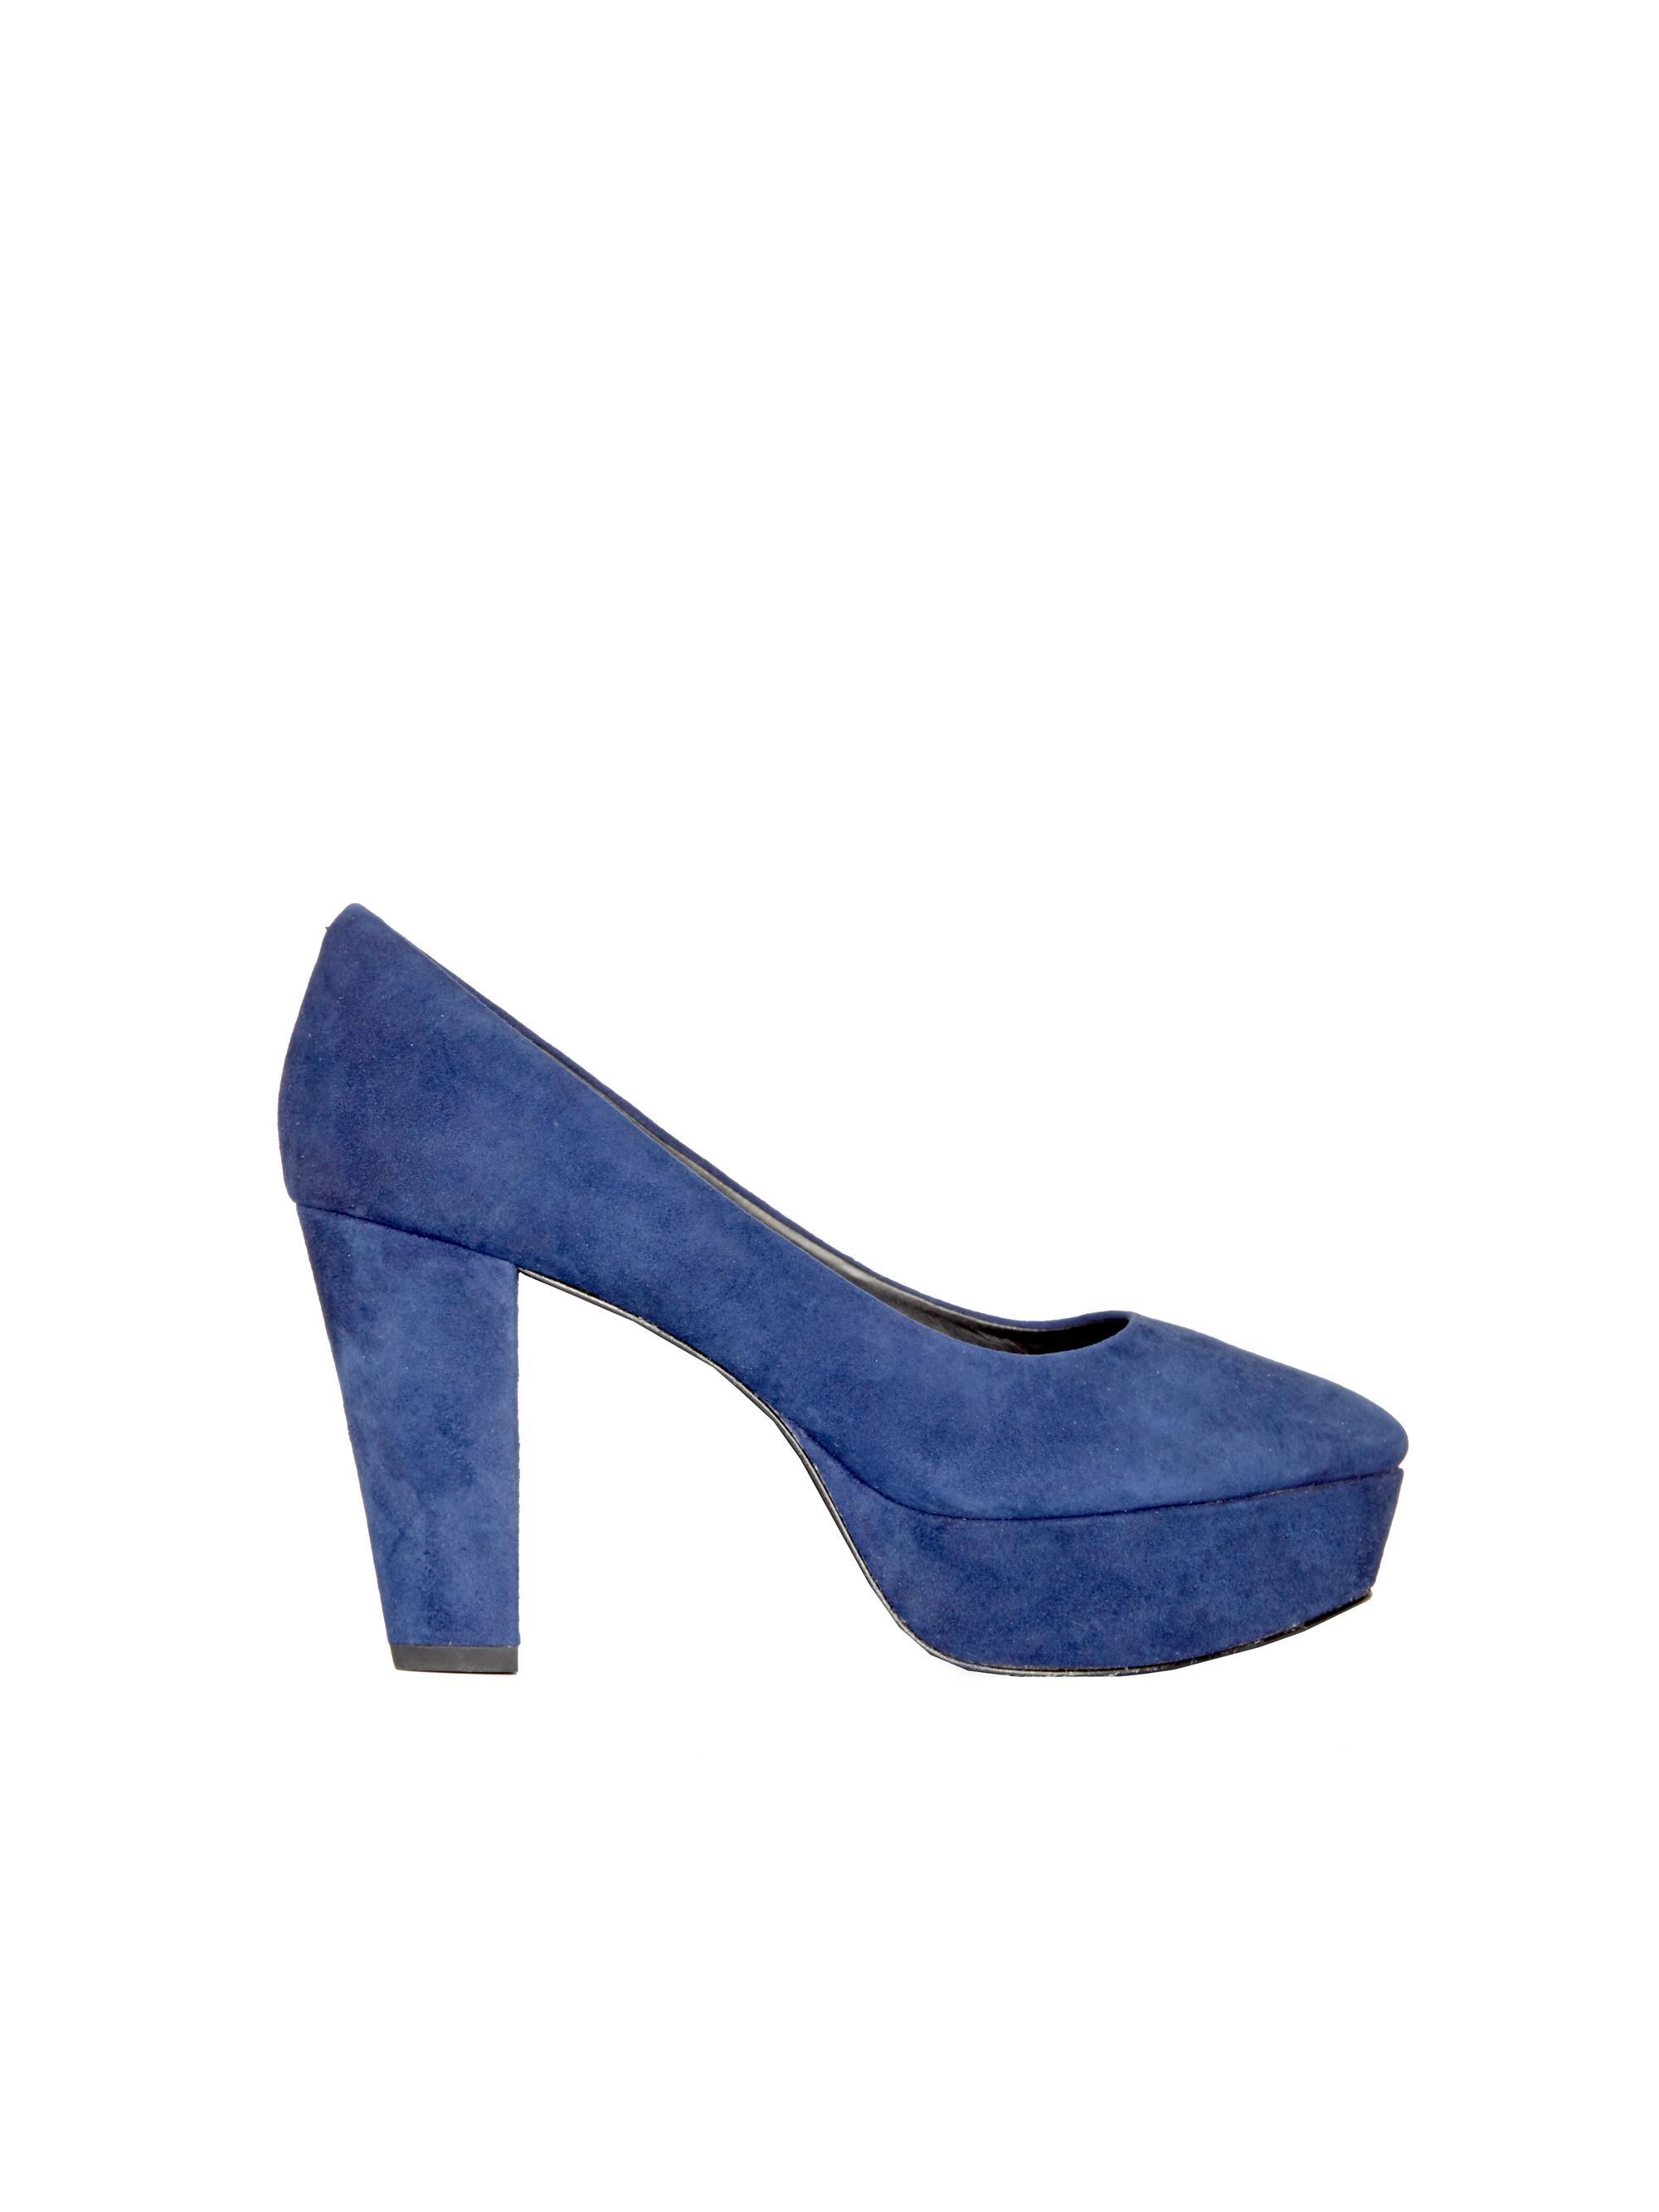 6ef992970e0 Lyst - Alice + Olivia Agnes Suede Heel in Blue